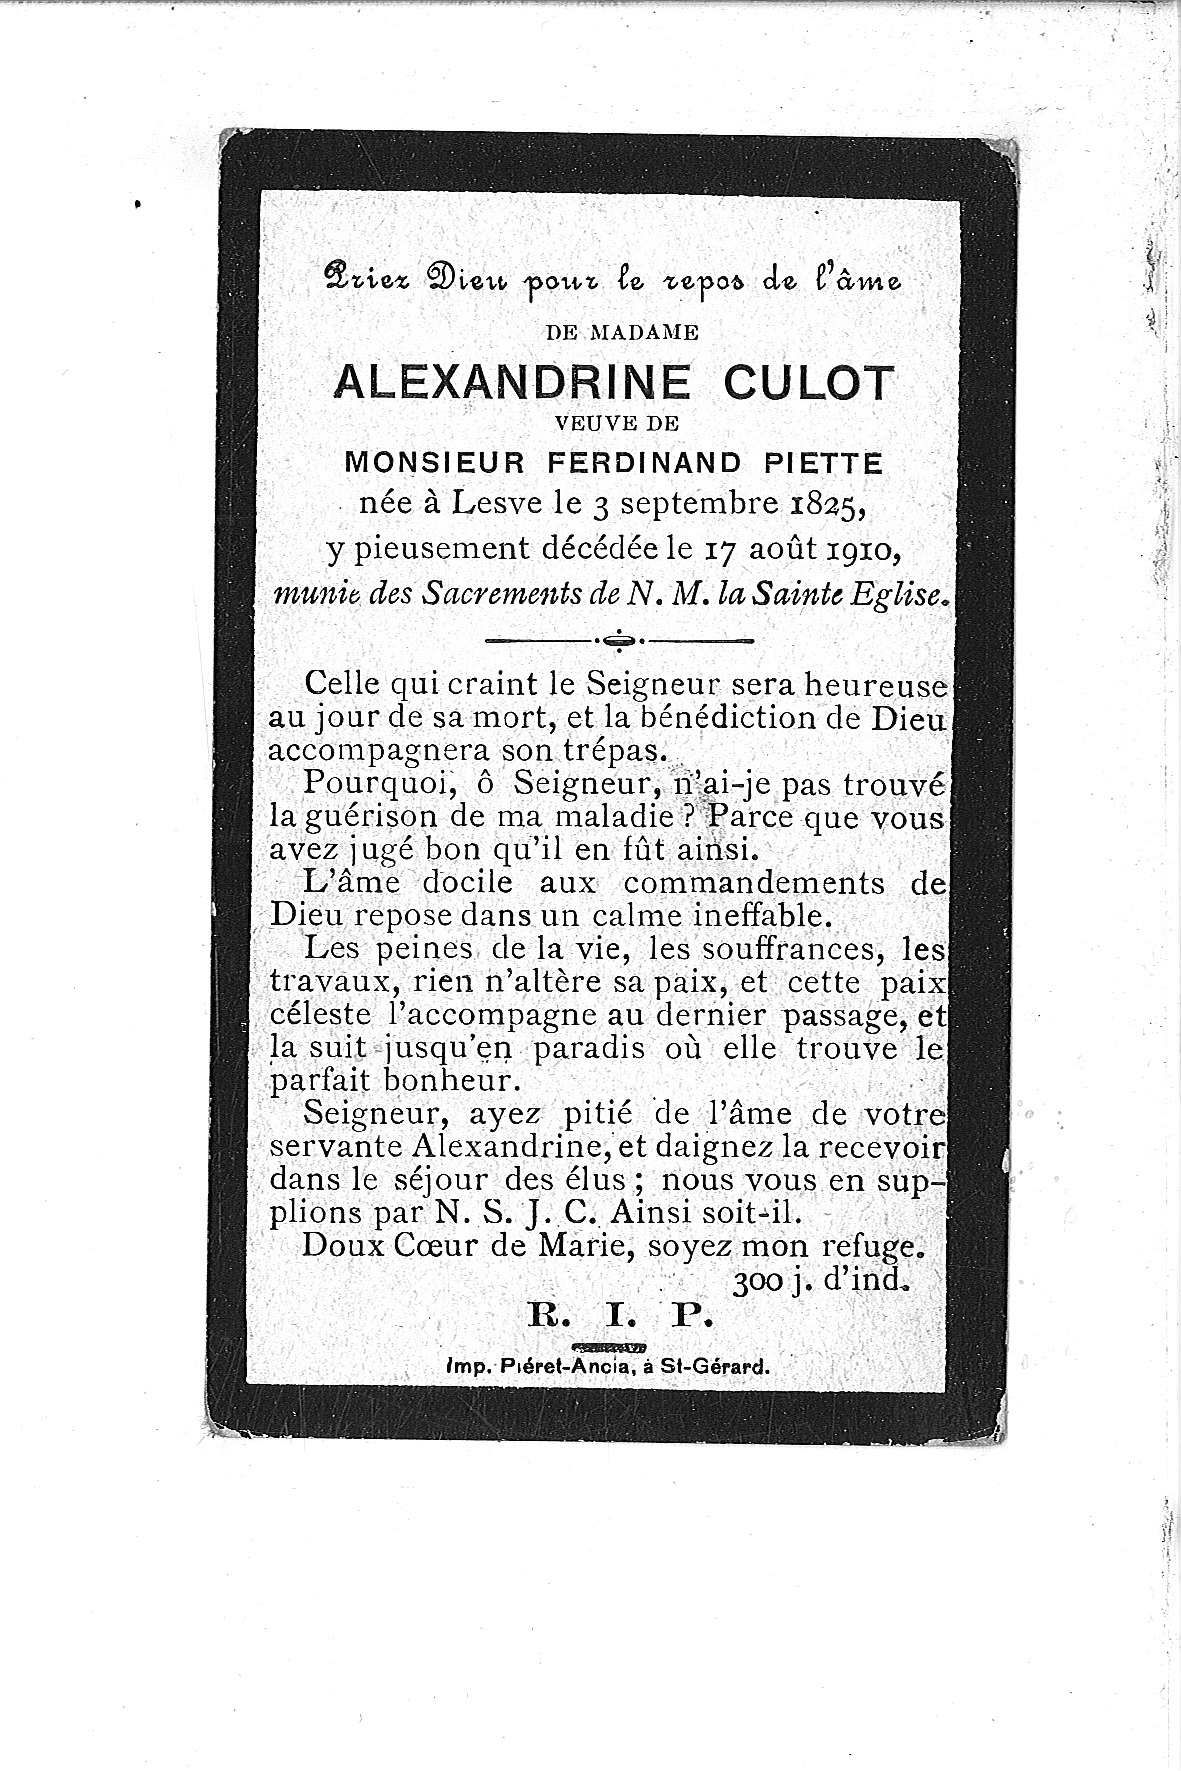 Alexandrine (1910) 20120117161928_00021.jpg